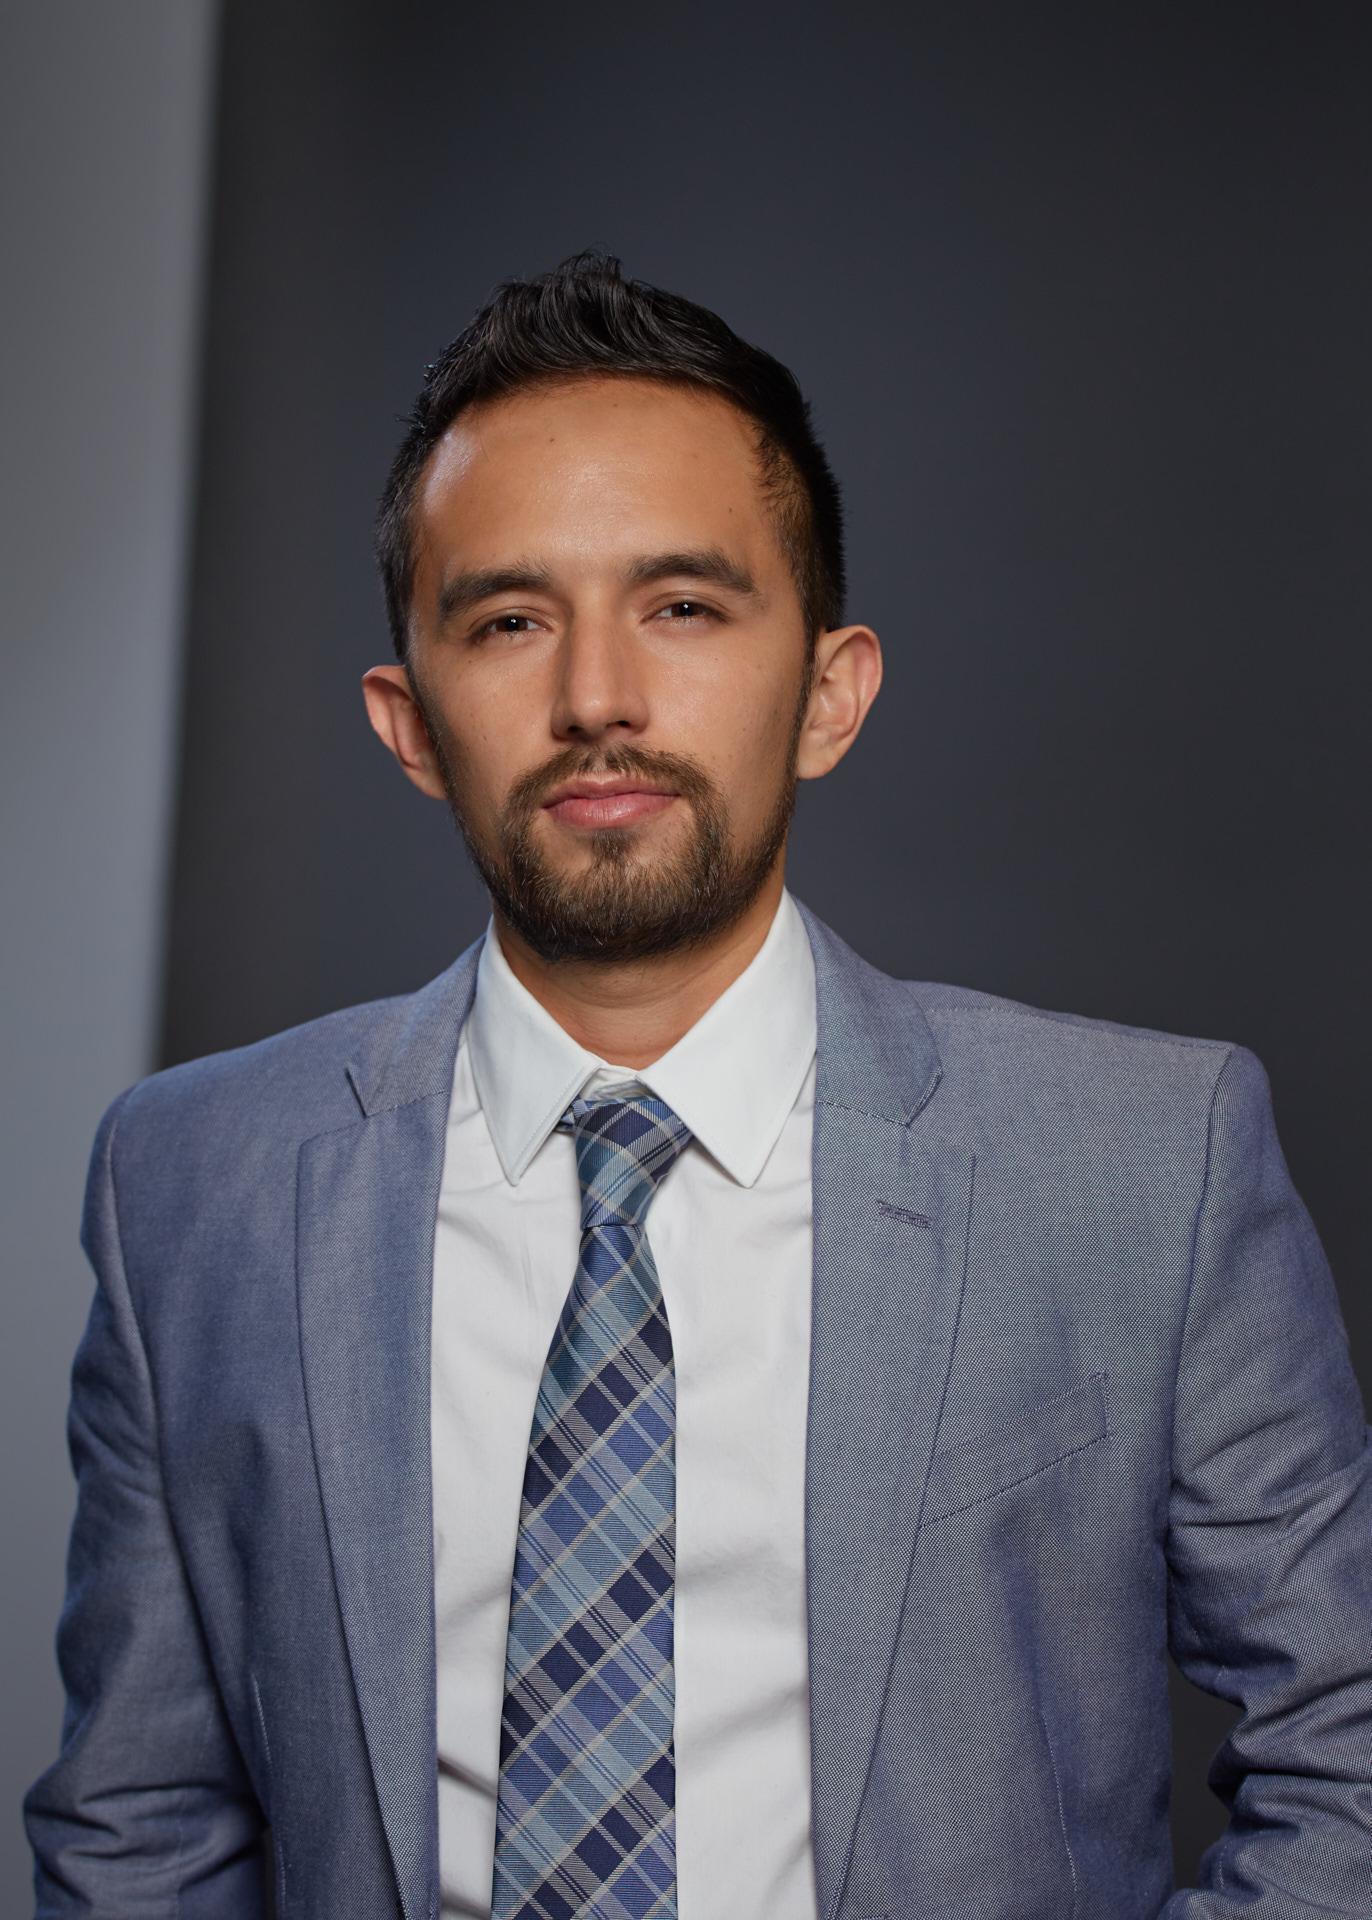 Carlos_Jimenez